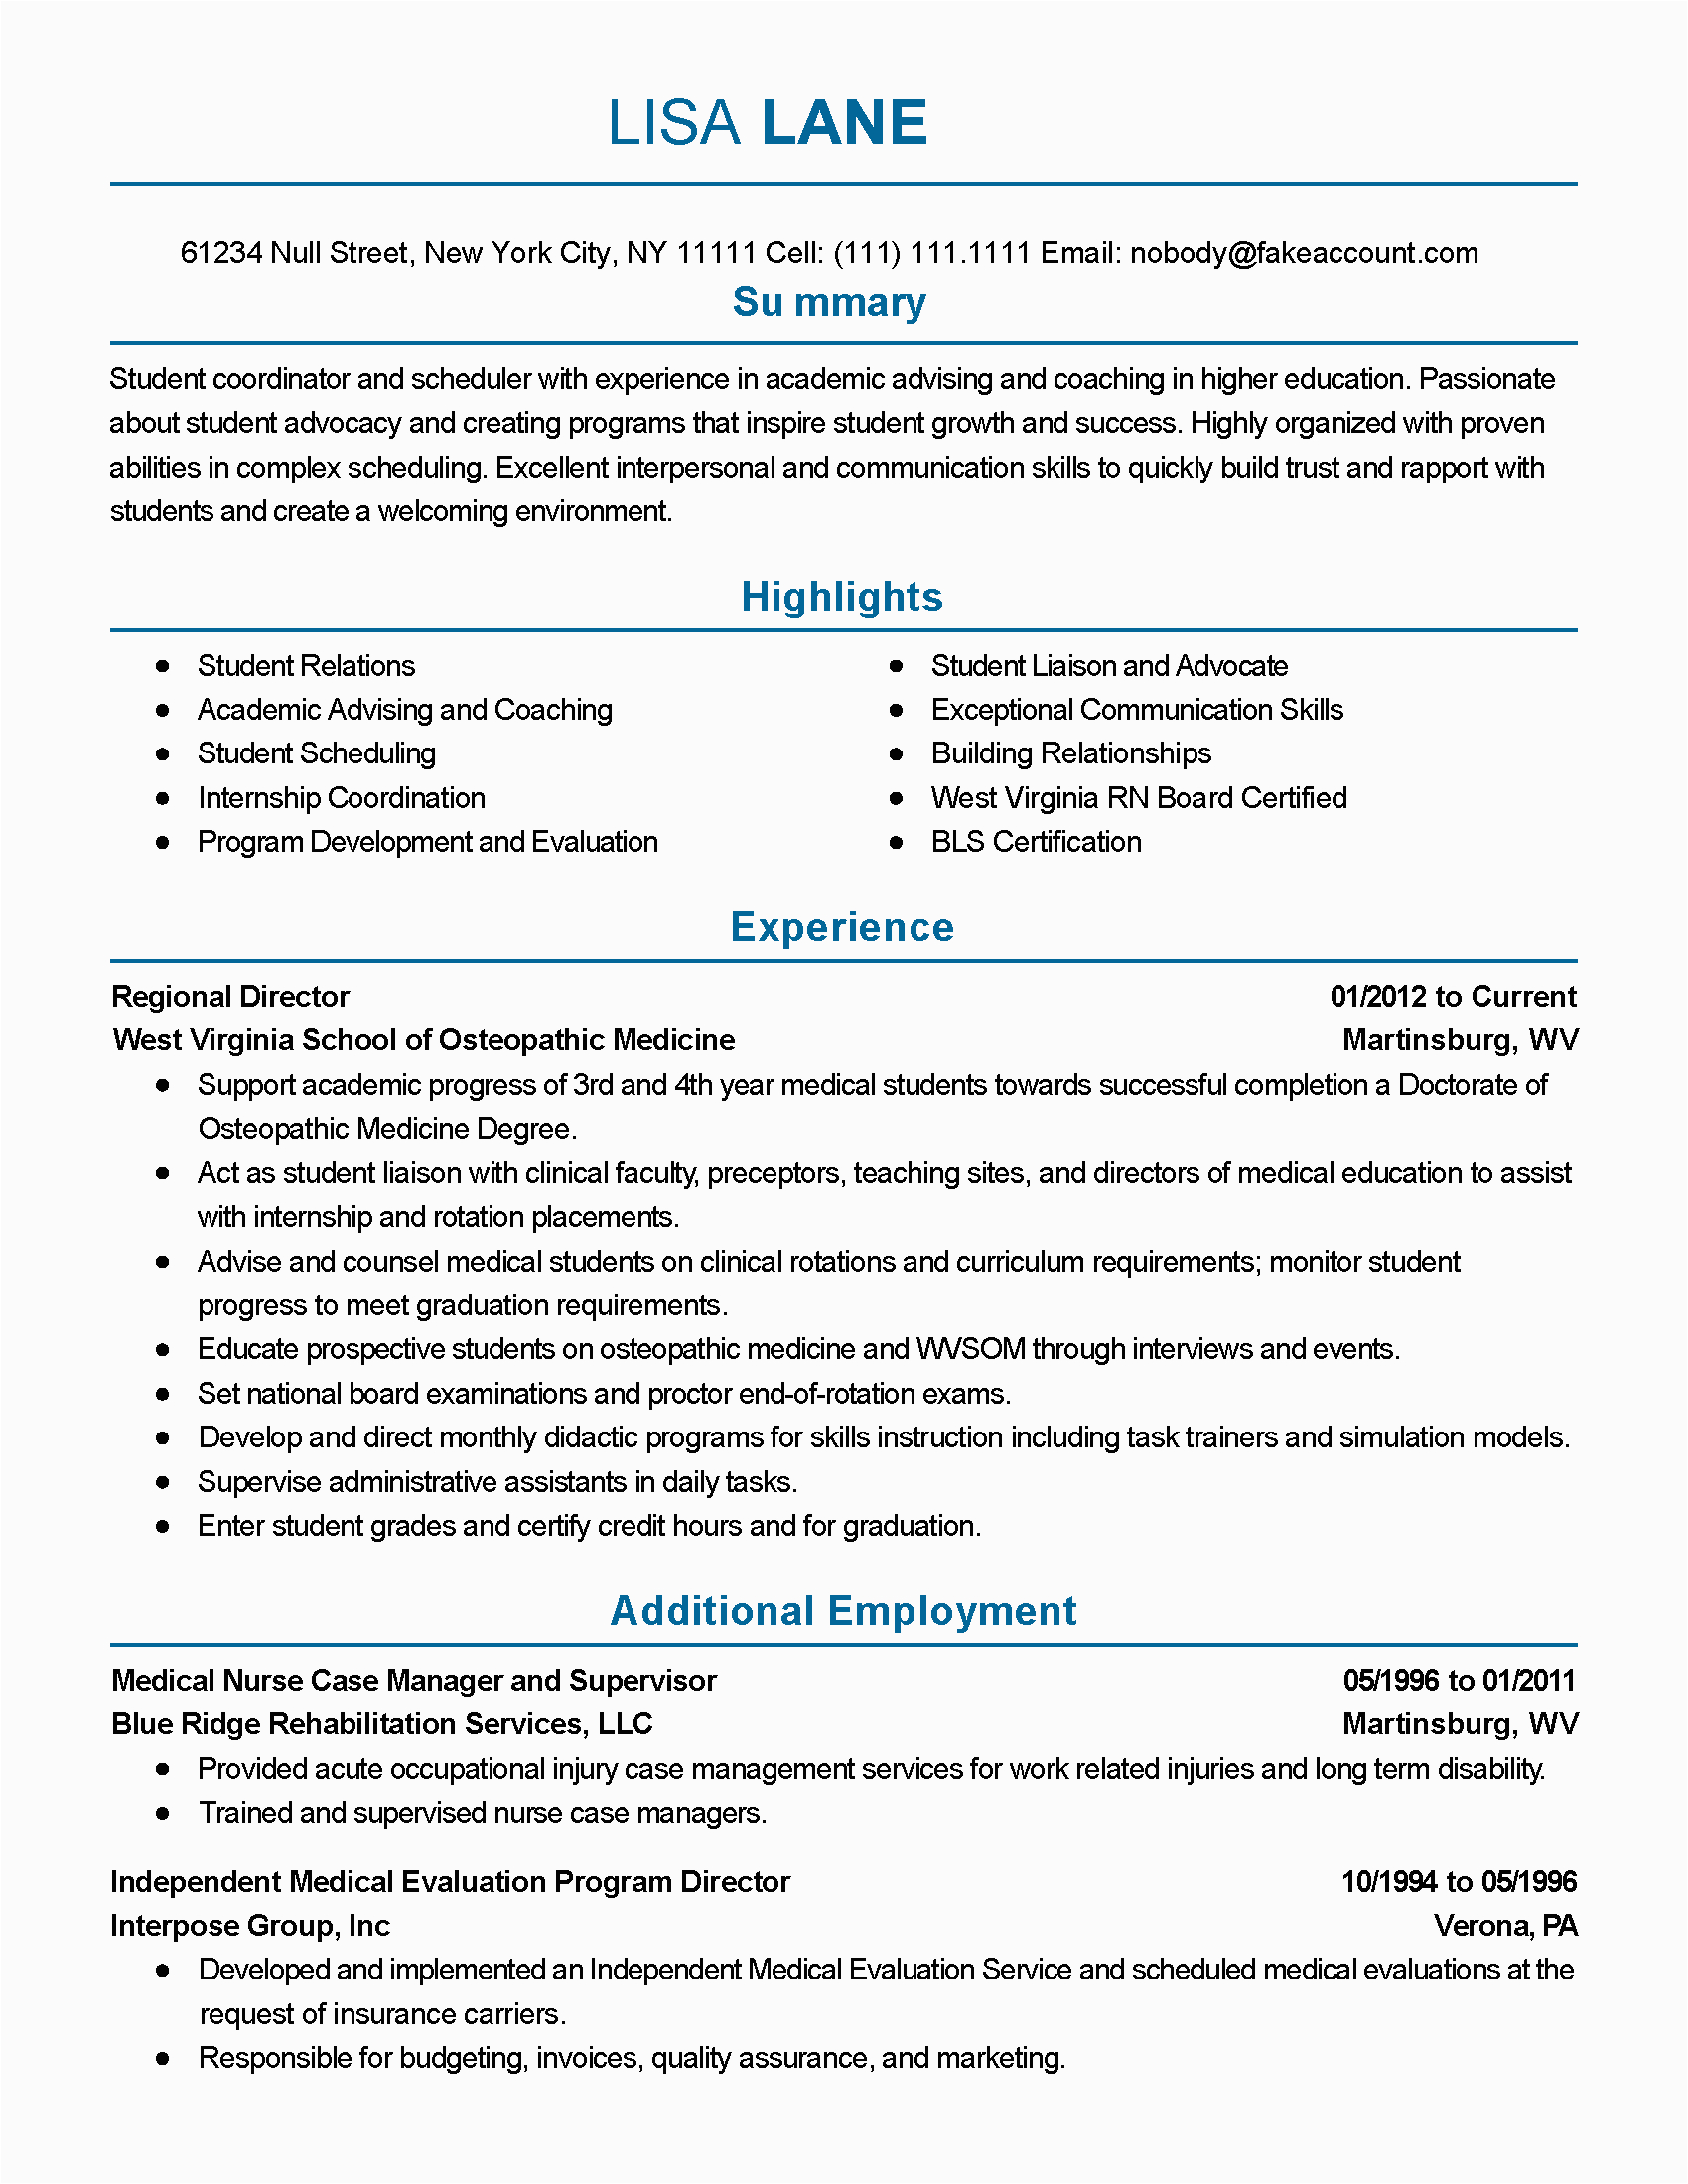 Resume Sample for Long Term Employment Resume Examples Long Term Employment Resume Examples